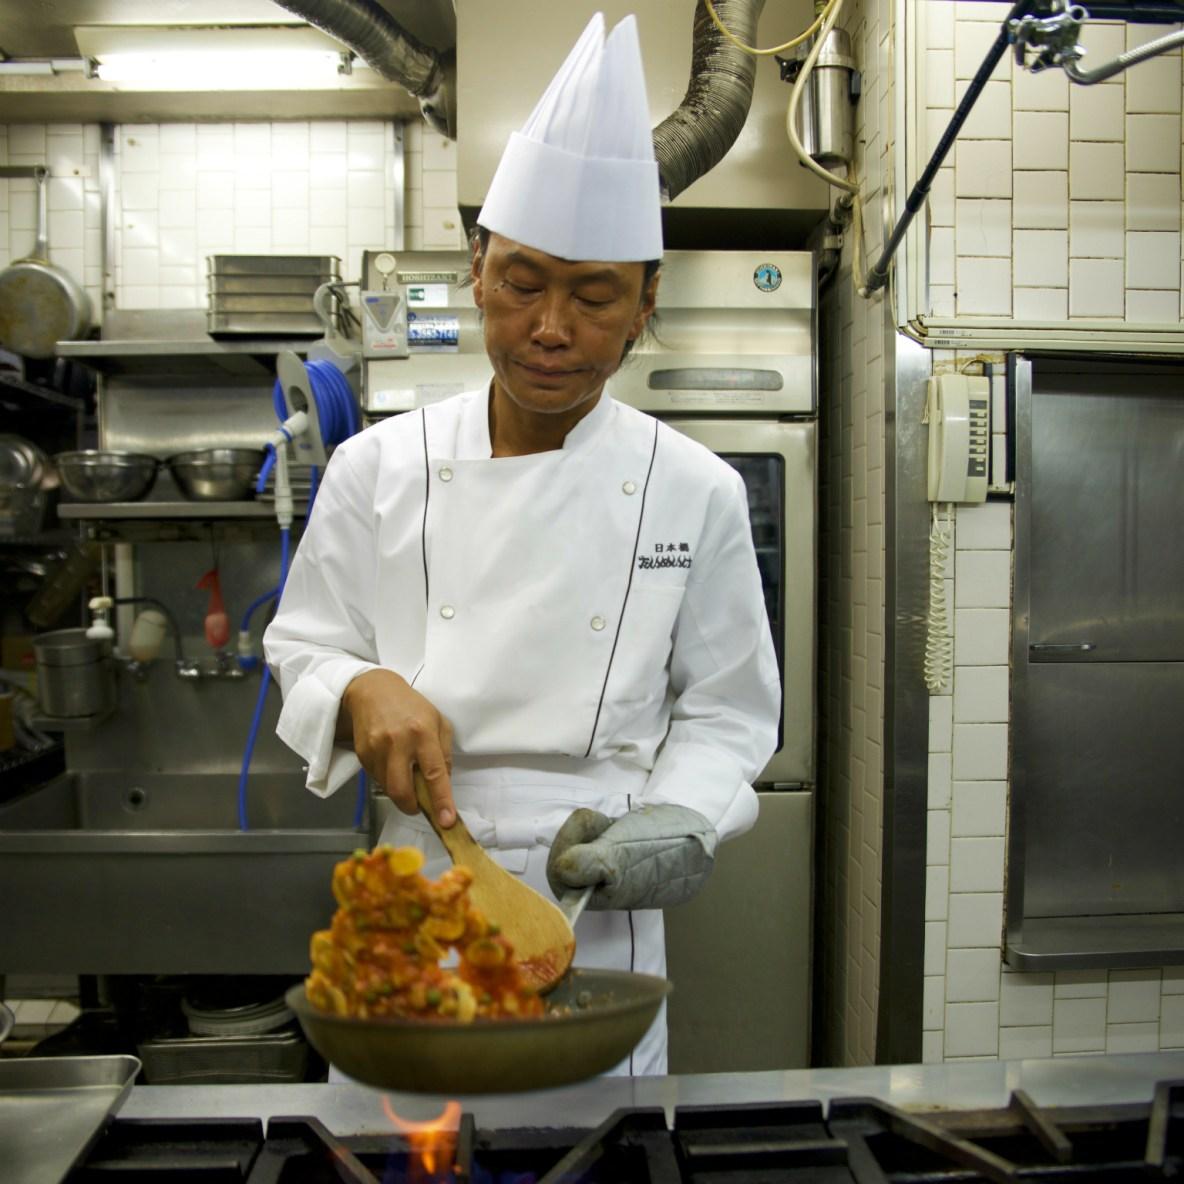 Retro specialist in pre-war Japan's interpretation of Western food